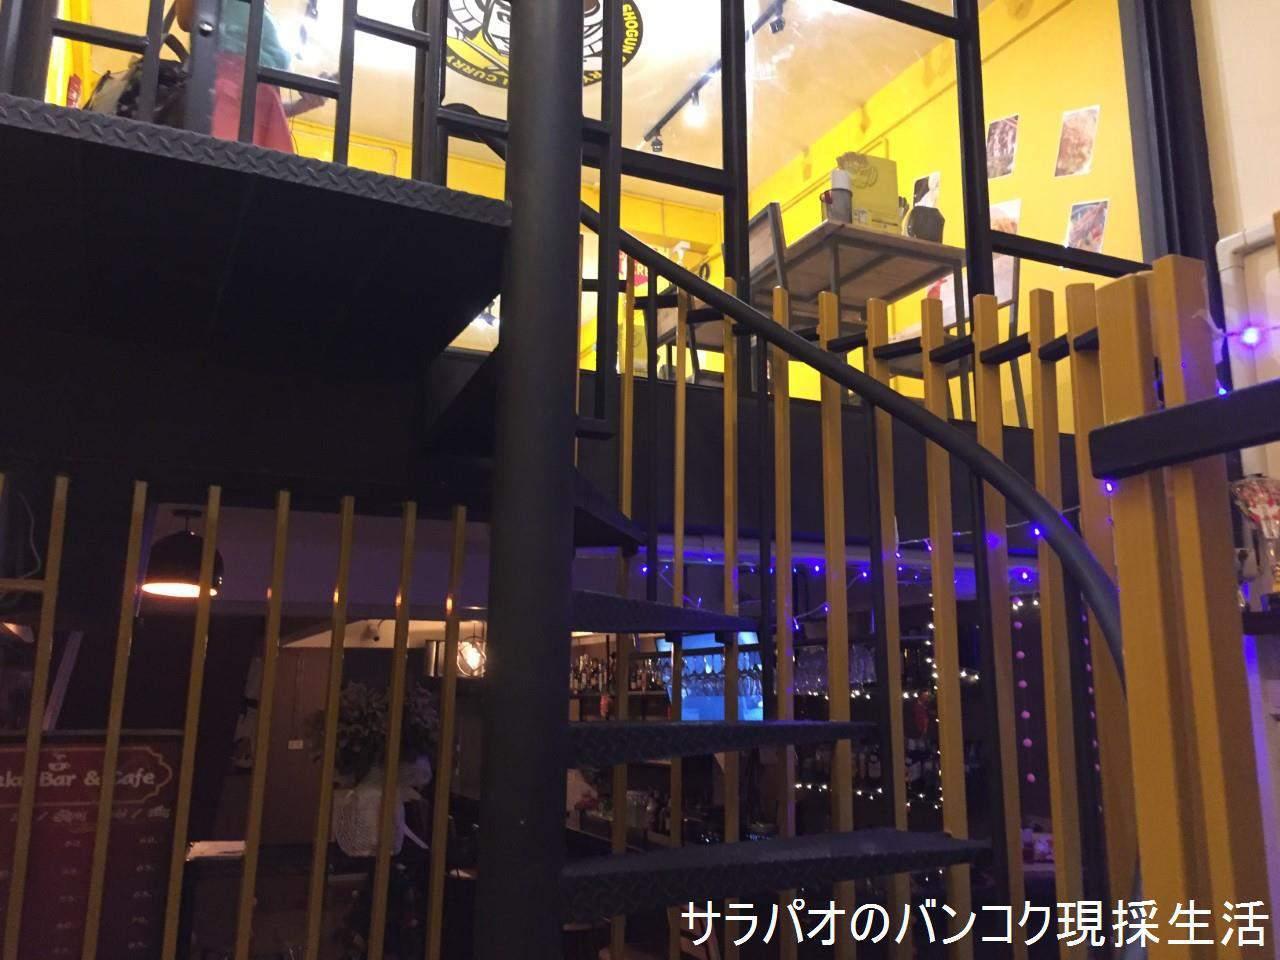 CurryShogun_06.jpg